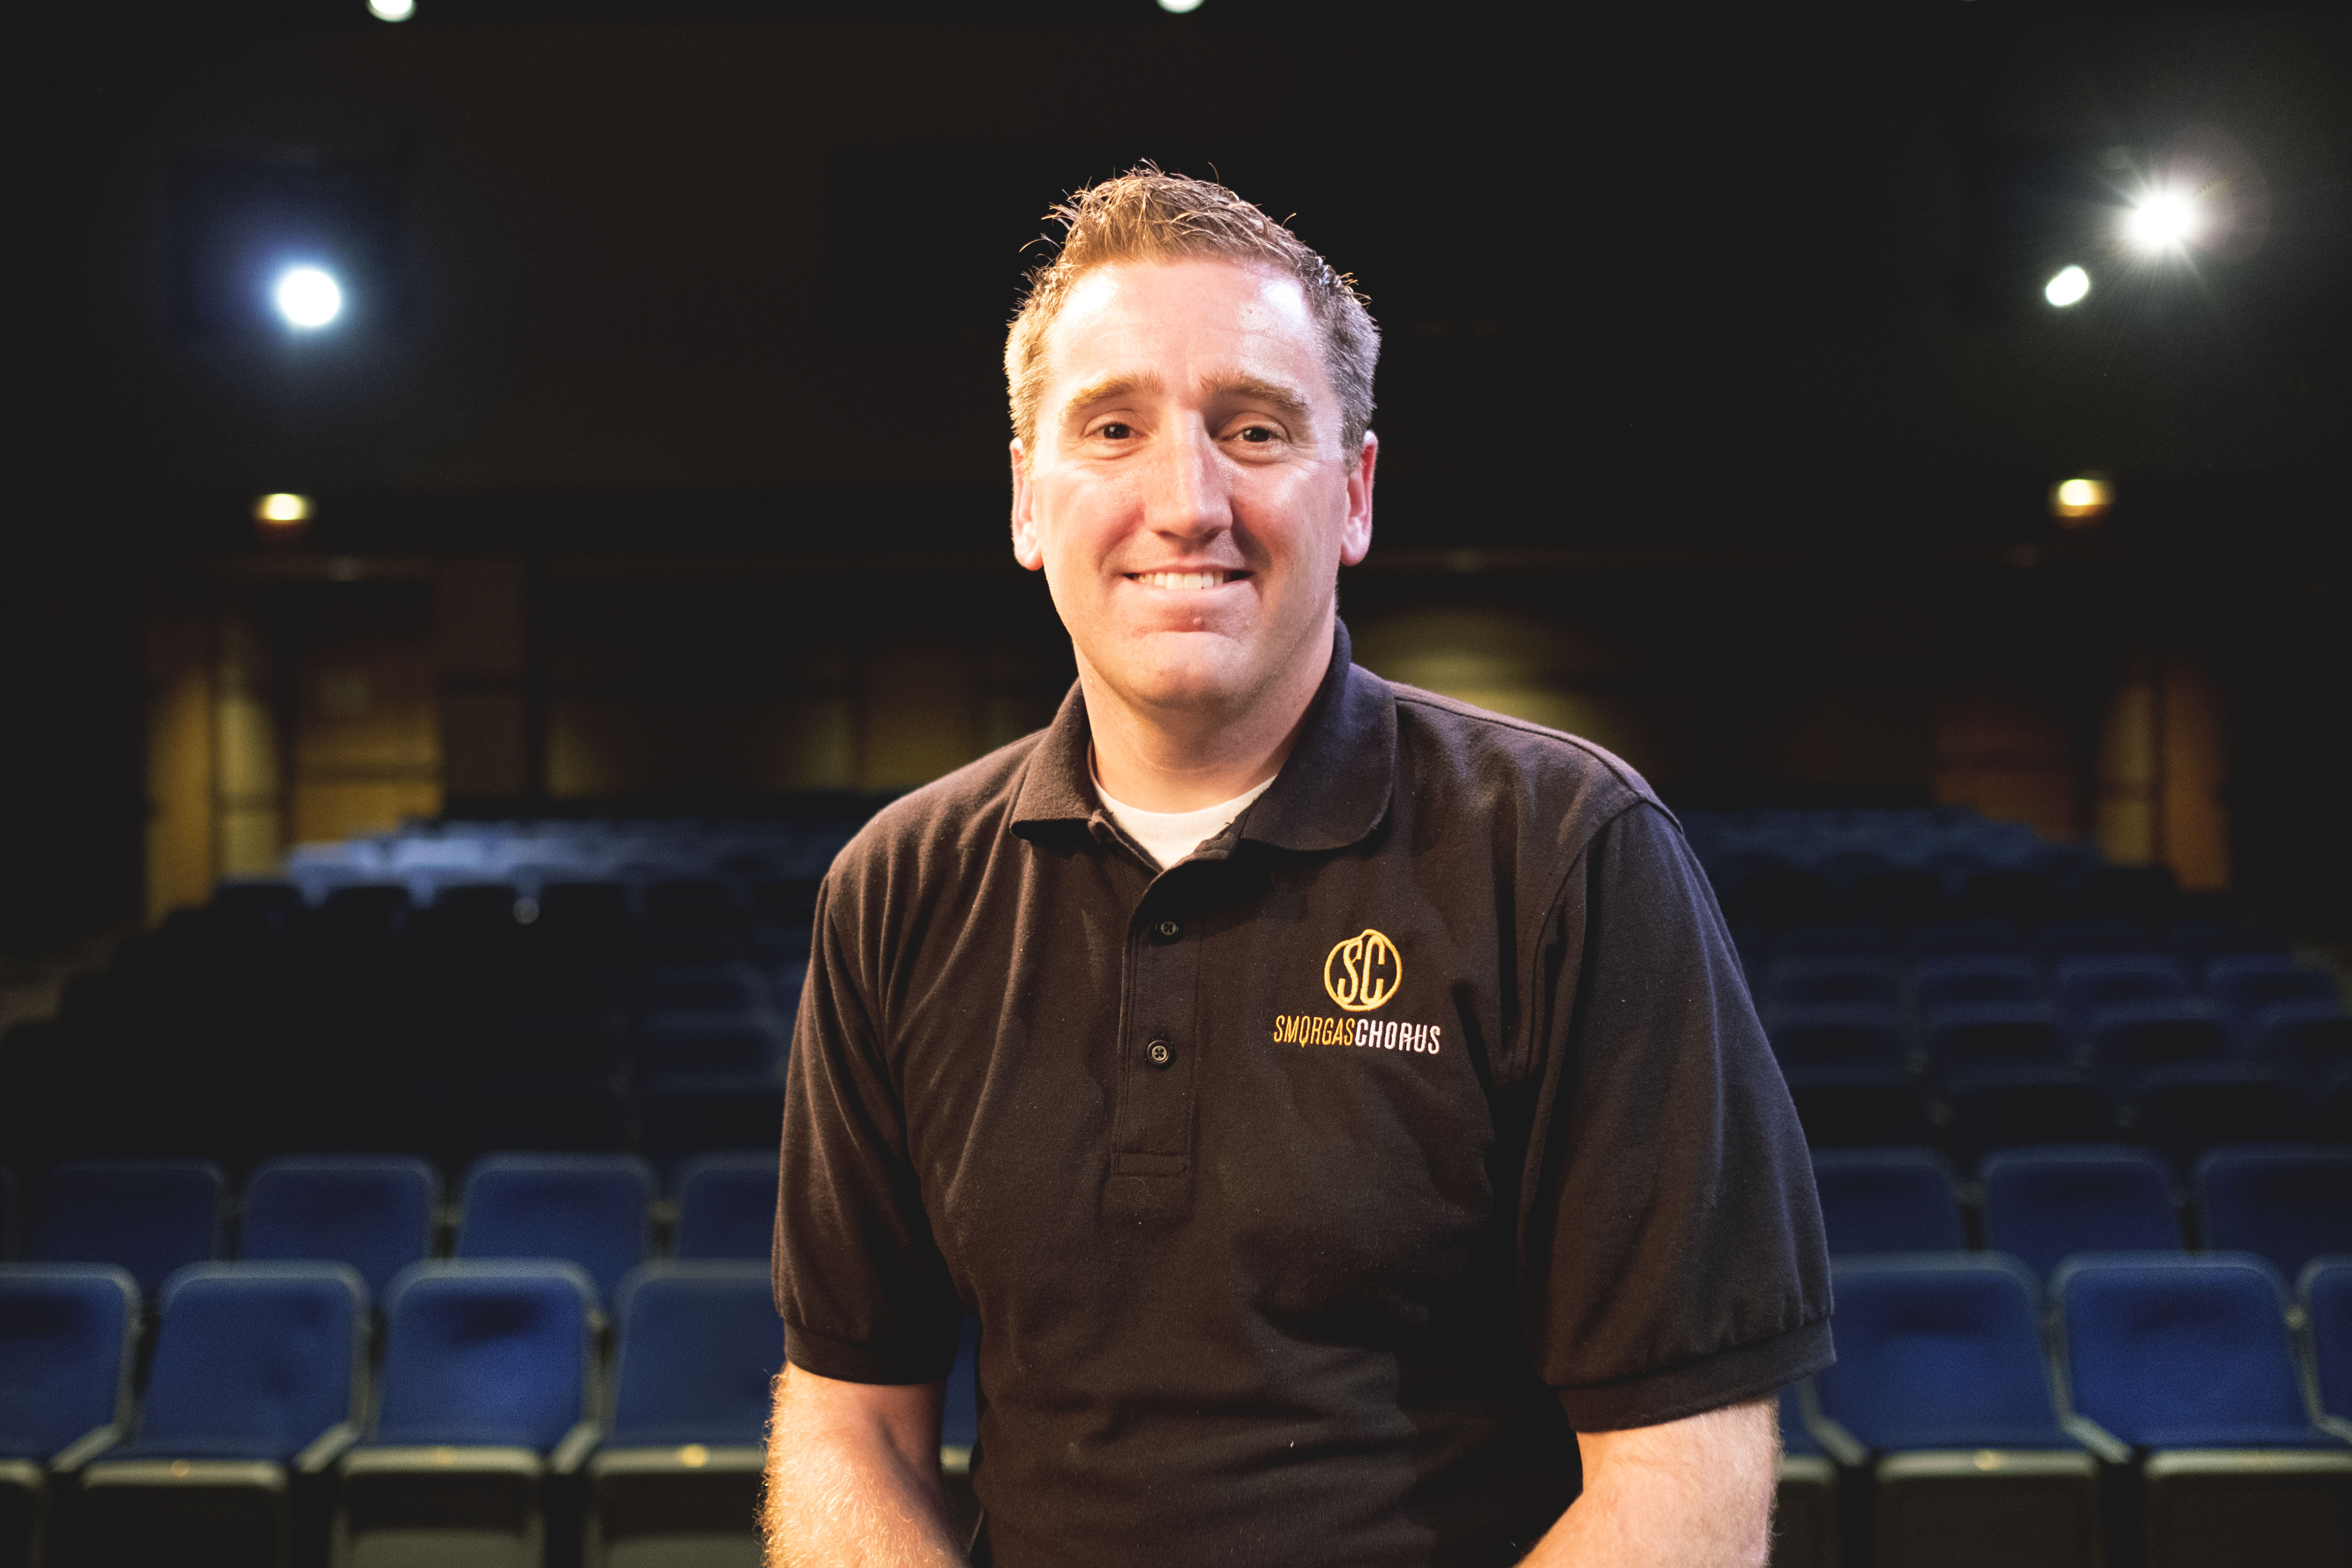 Todd Brumley